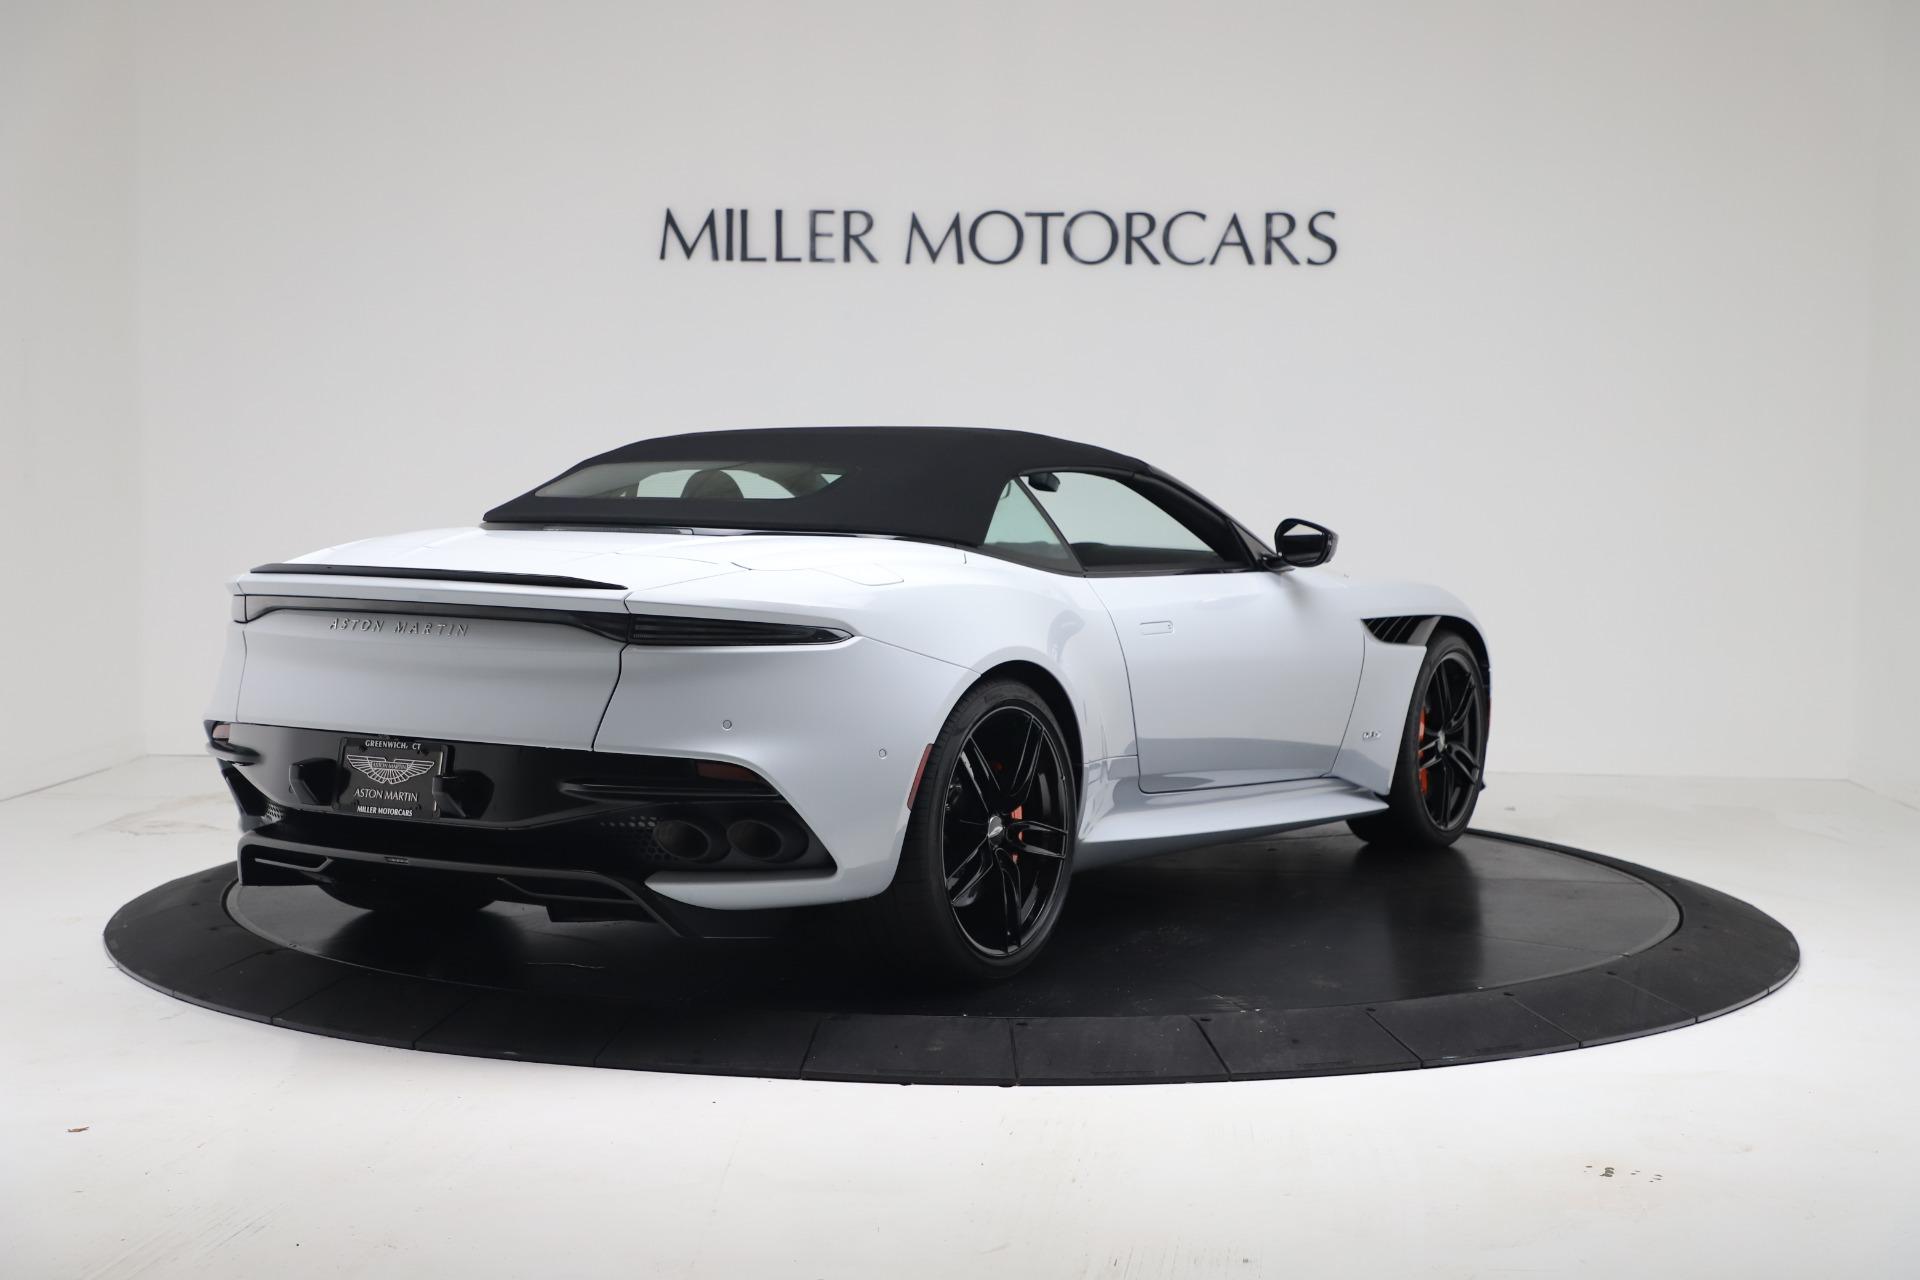 New 2020 Aston Martin DBS Superleggera Volante Convertible For Sale In Westport, CT 3484_p16